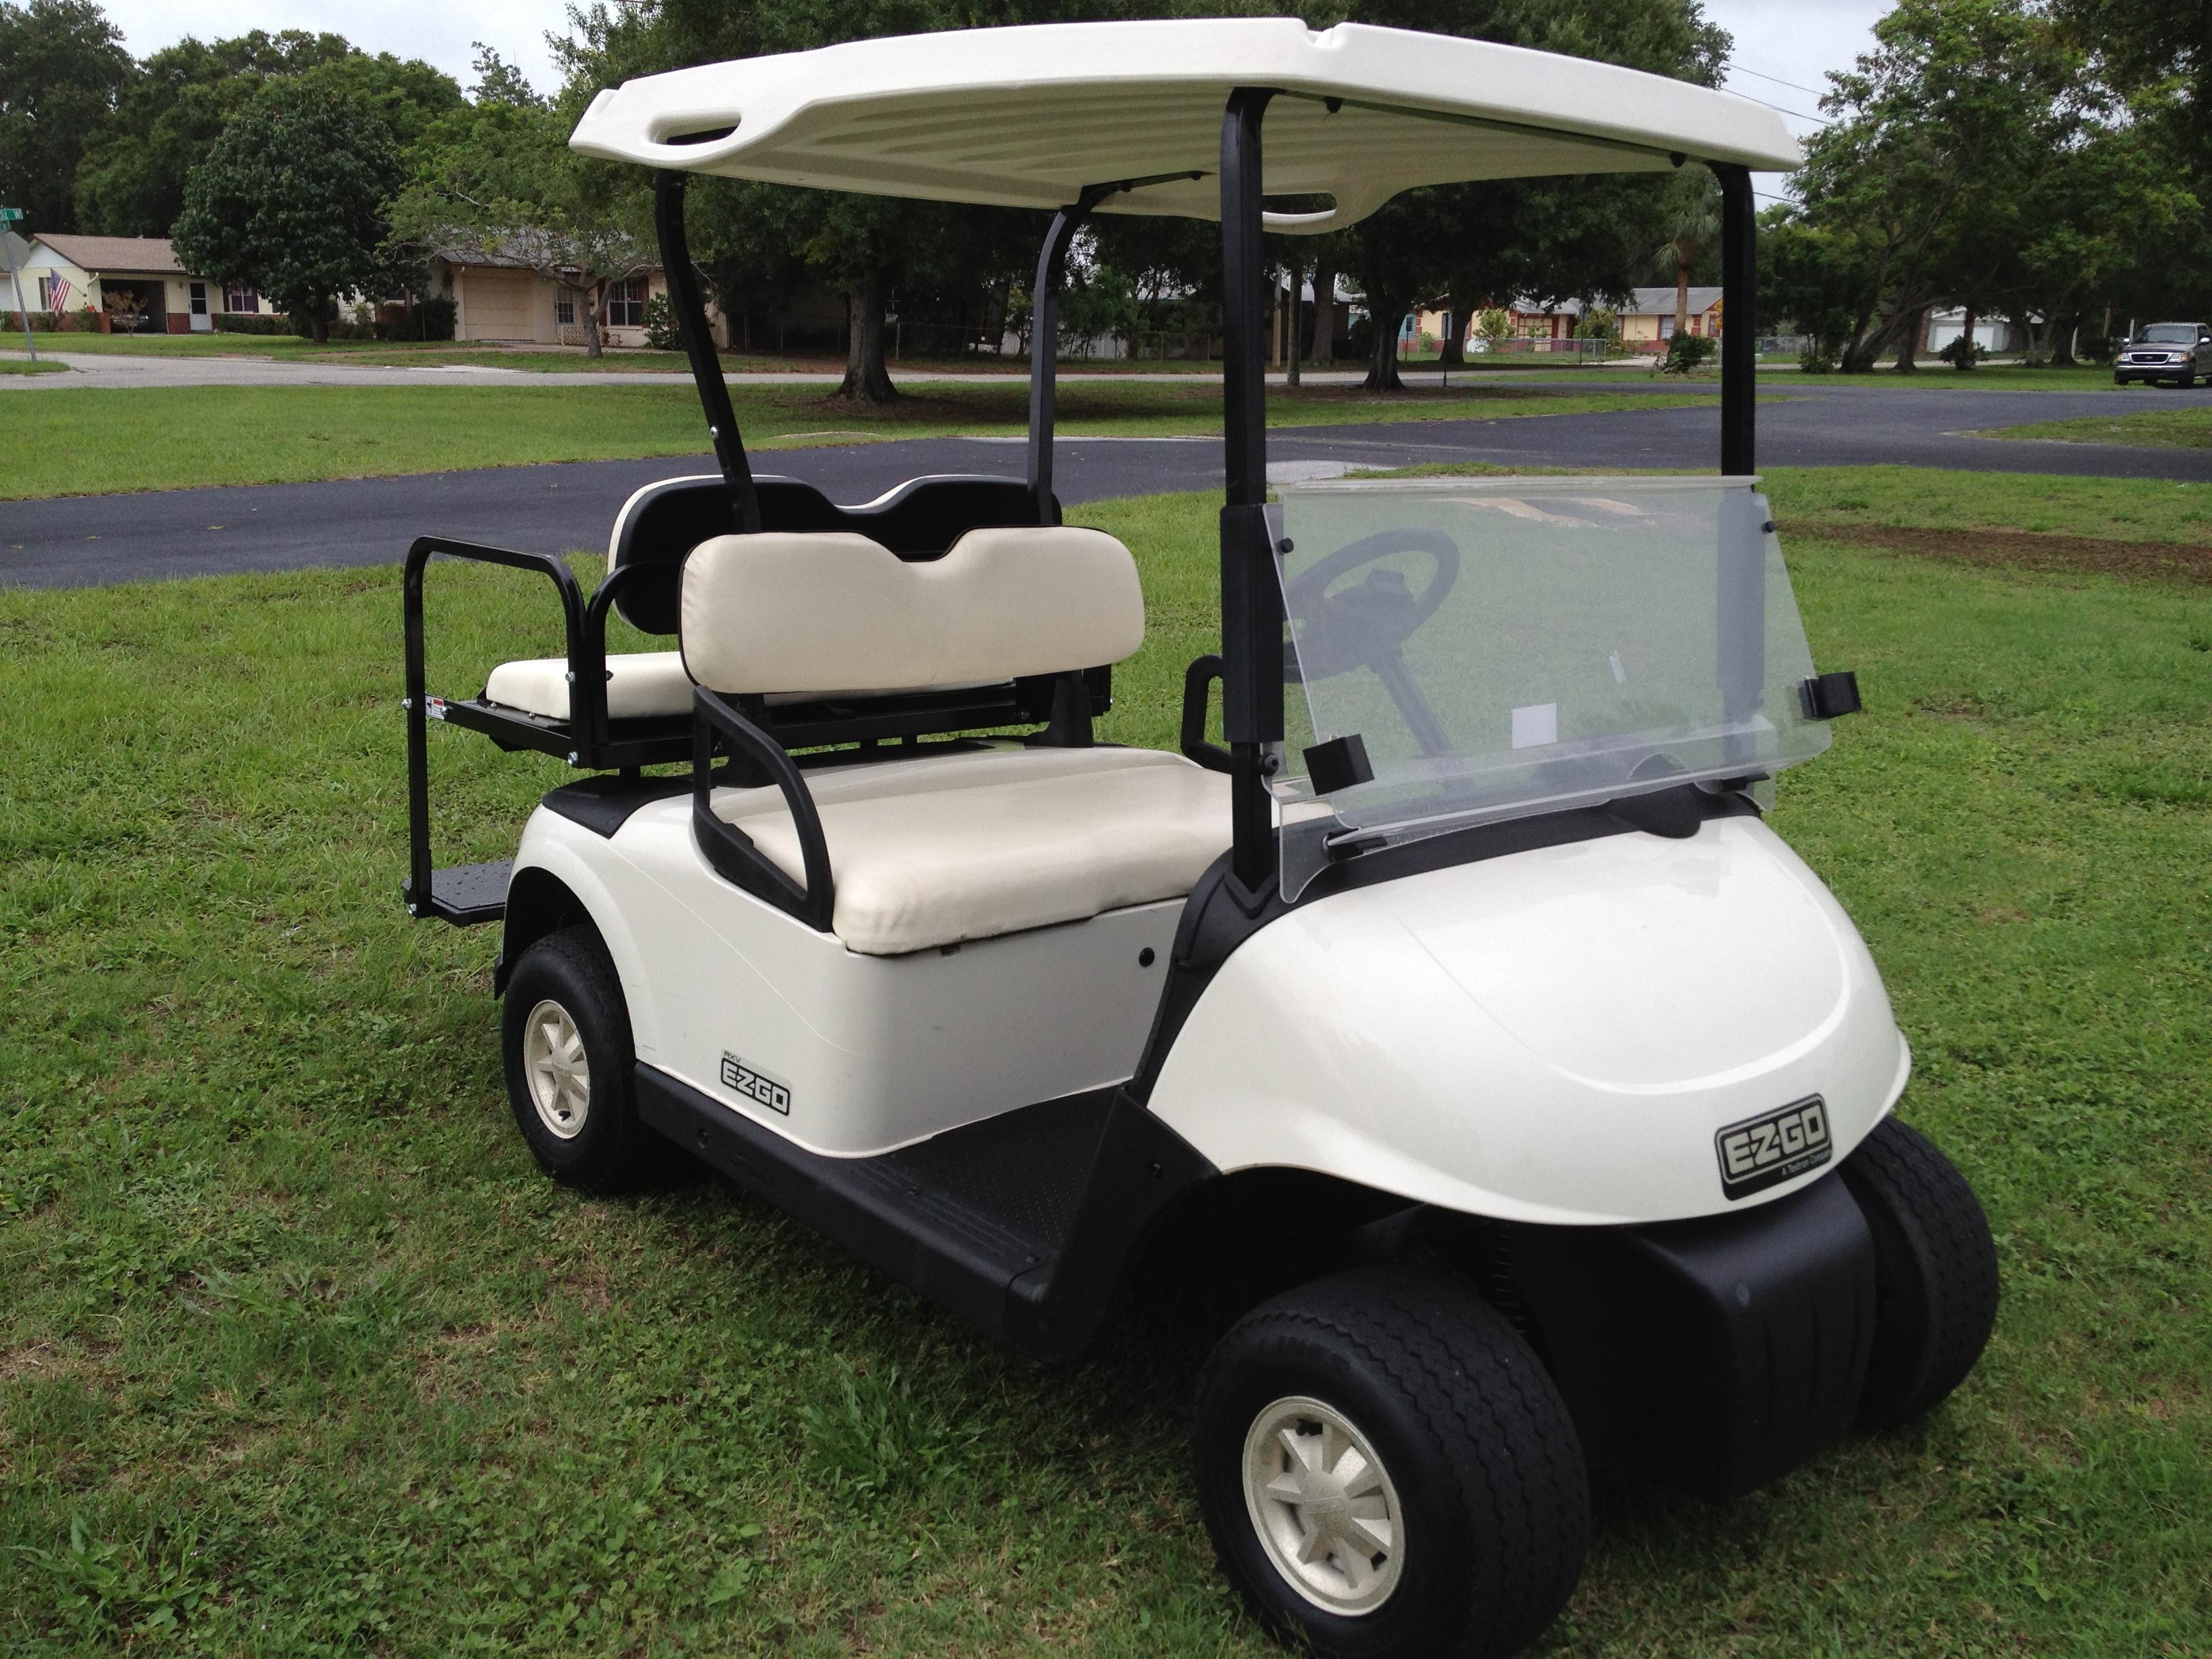 2009 ezgo rxv golf cart 4 seat tiger 39 s discount store. Black Bedroom Furniture Sets. Home Design Ideas